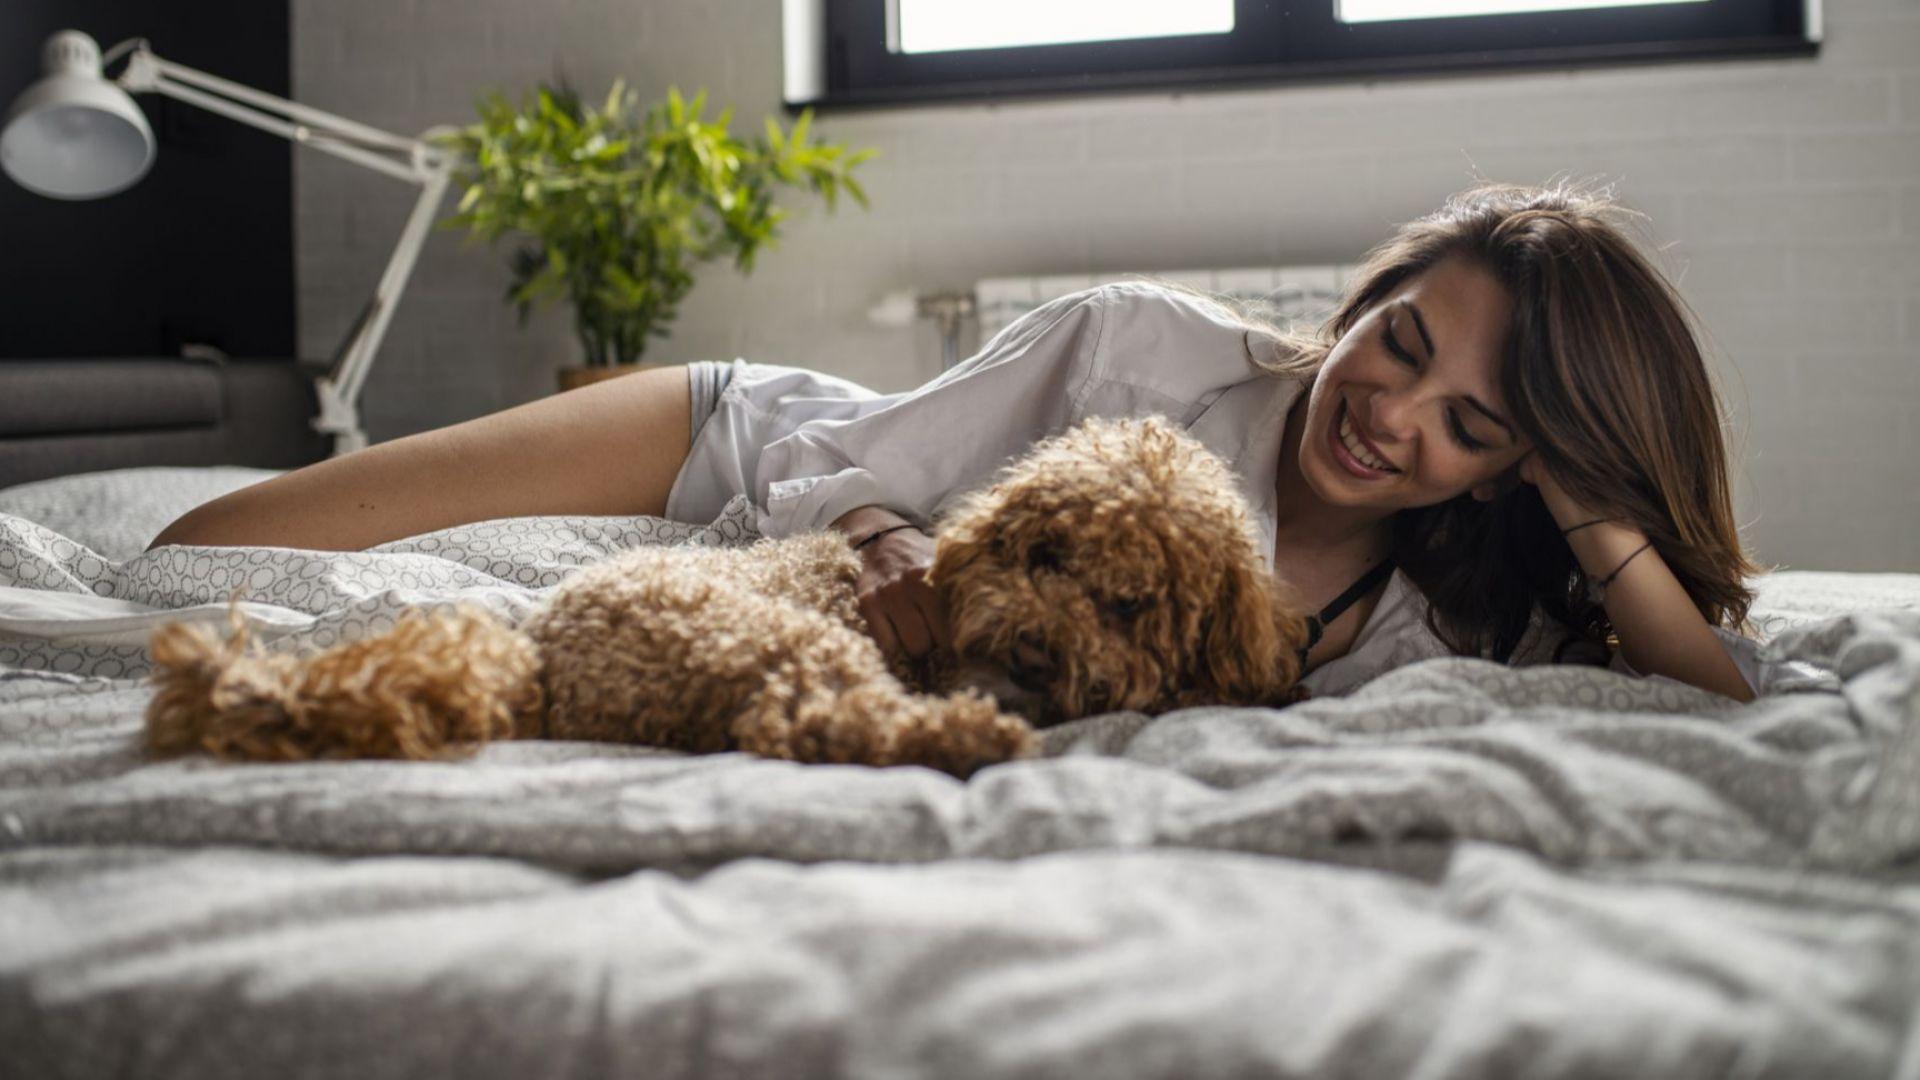 Допускането на кучетата до леглата ни е полезно за нашето здраве